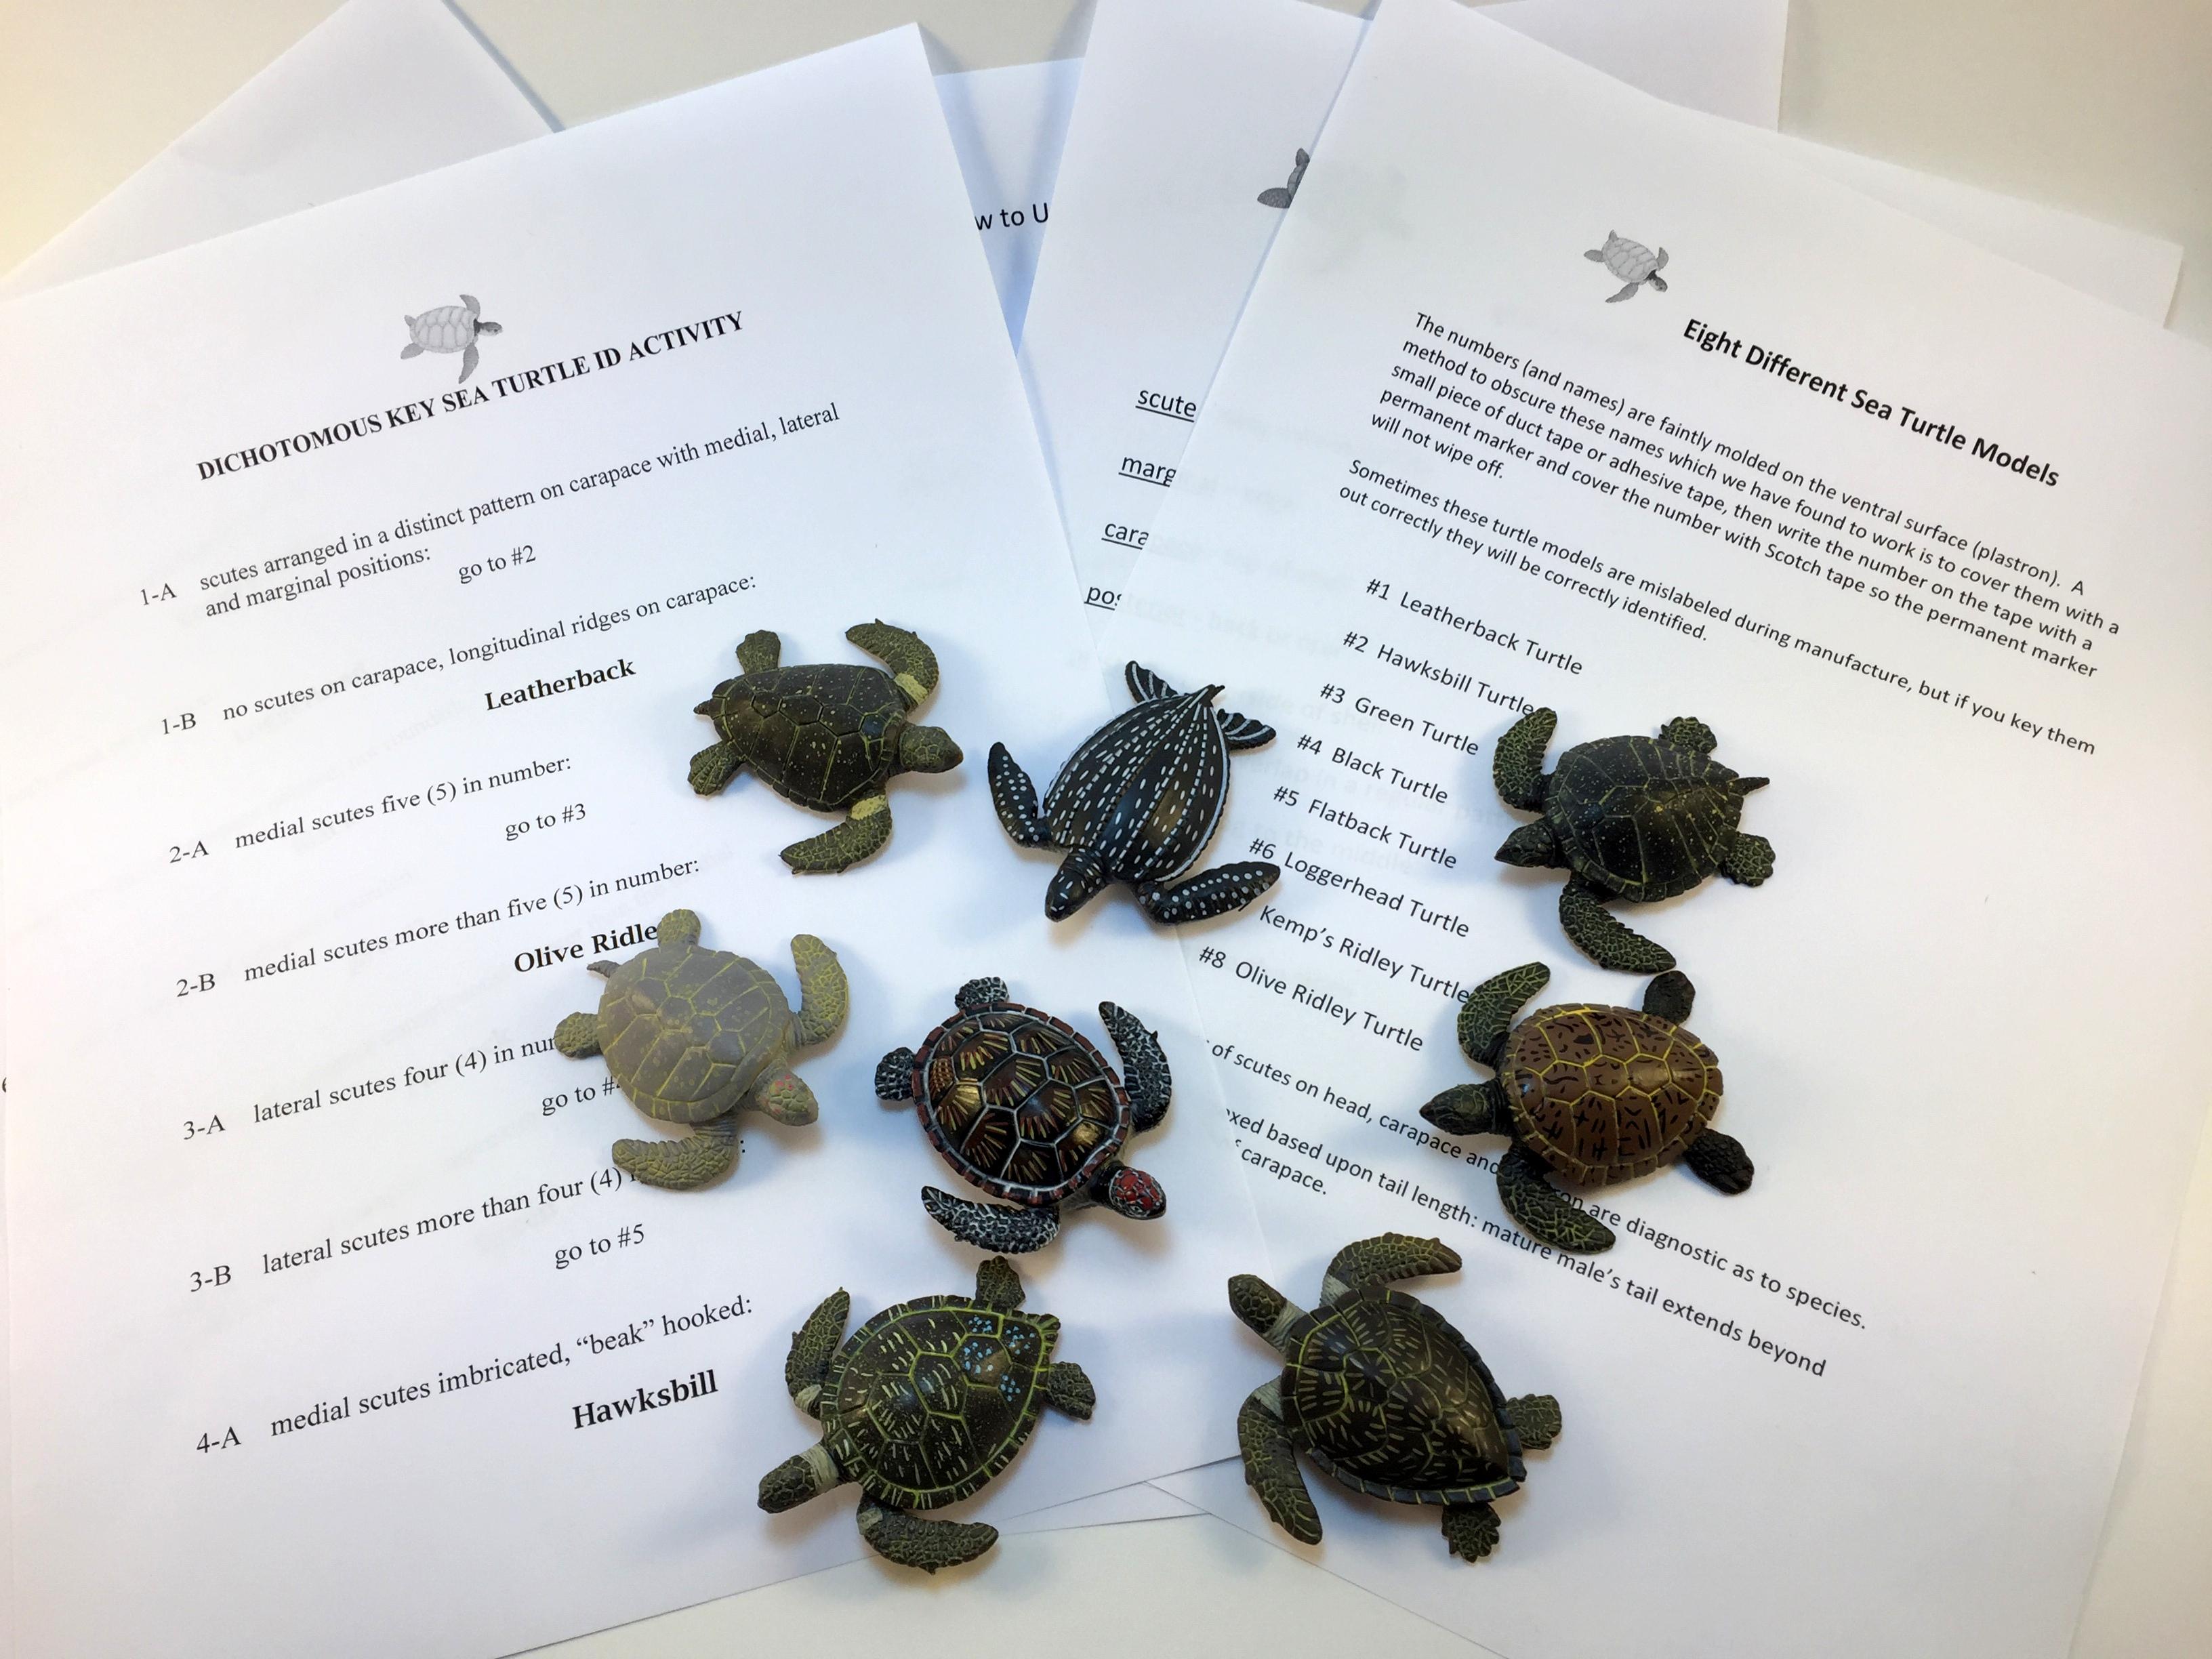 Sea Turtle Dichotomous Key Activity